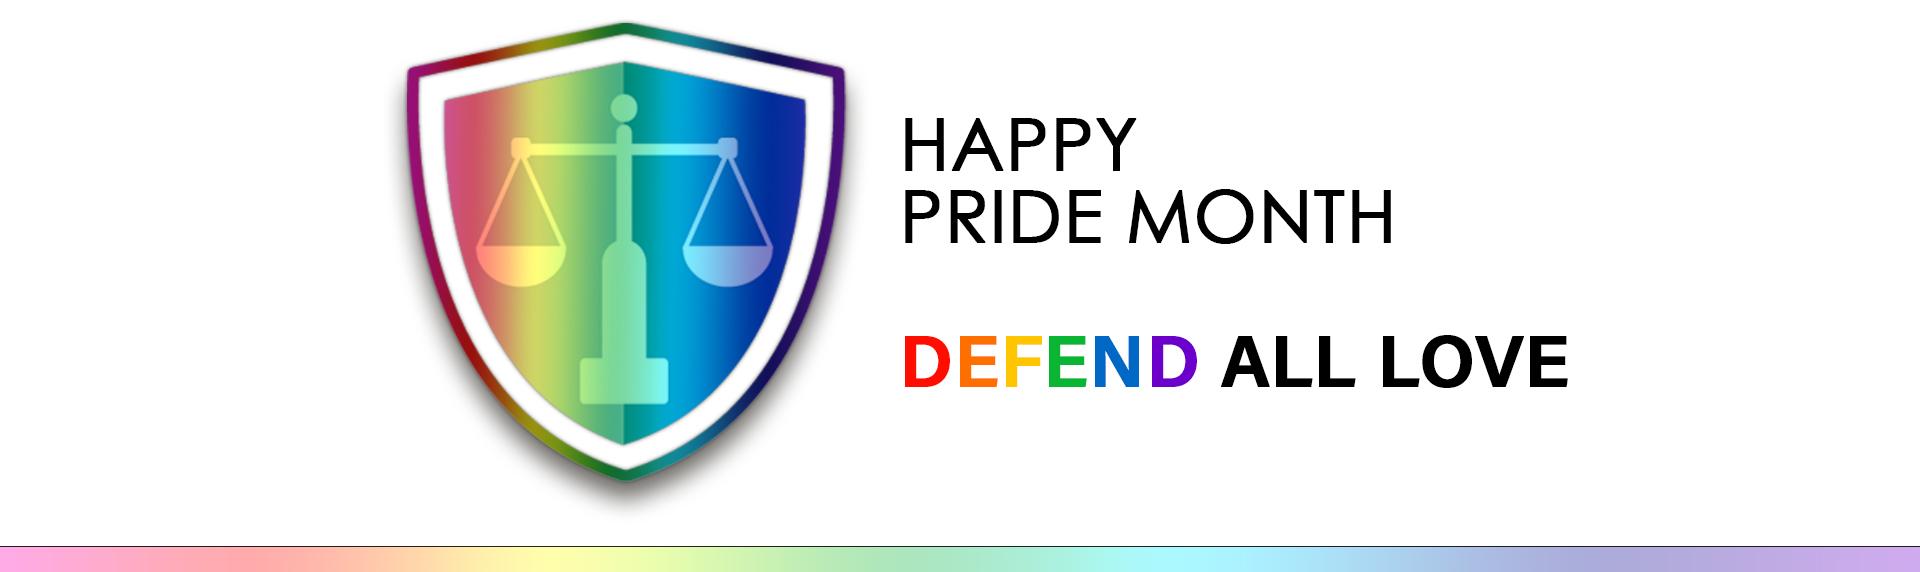 Happy Pride Month - Defend ALL Love